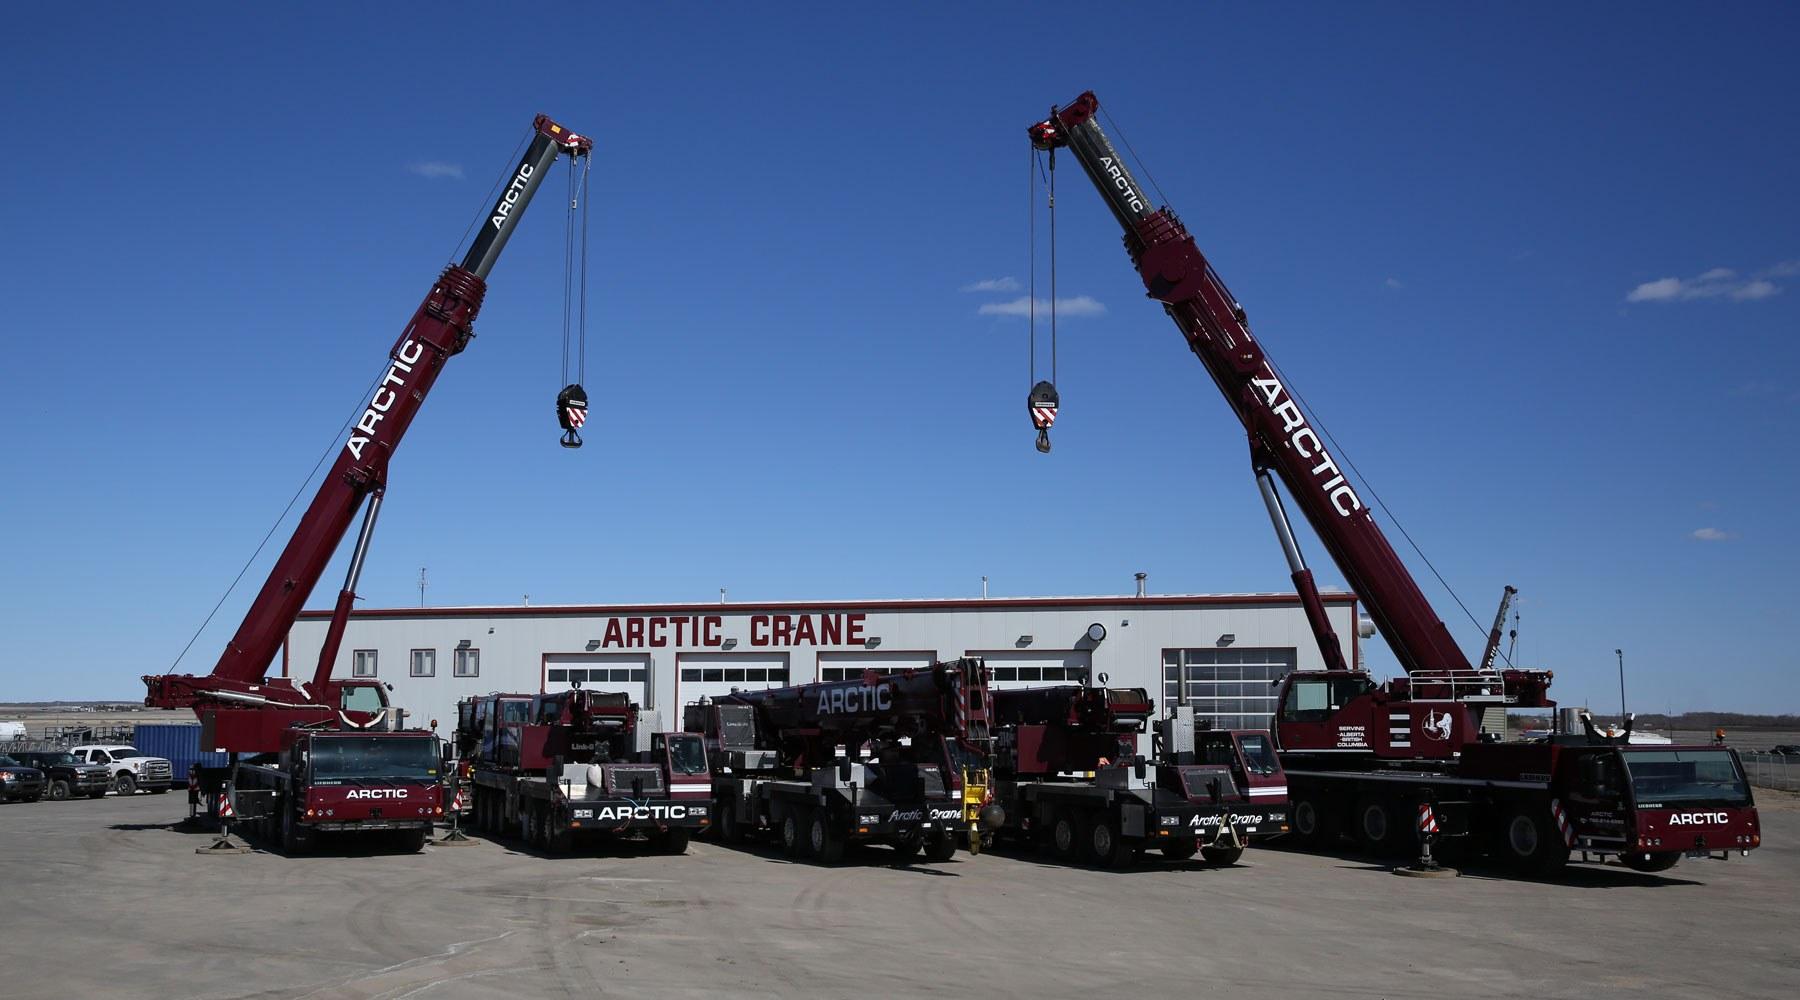 Cranes from Centurion company Arctic Crane